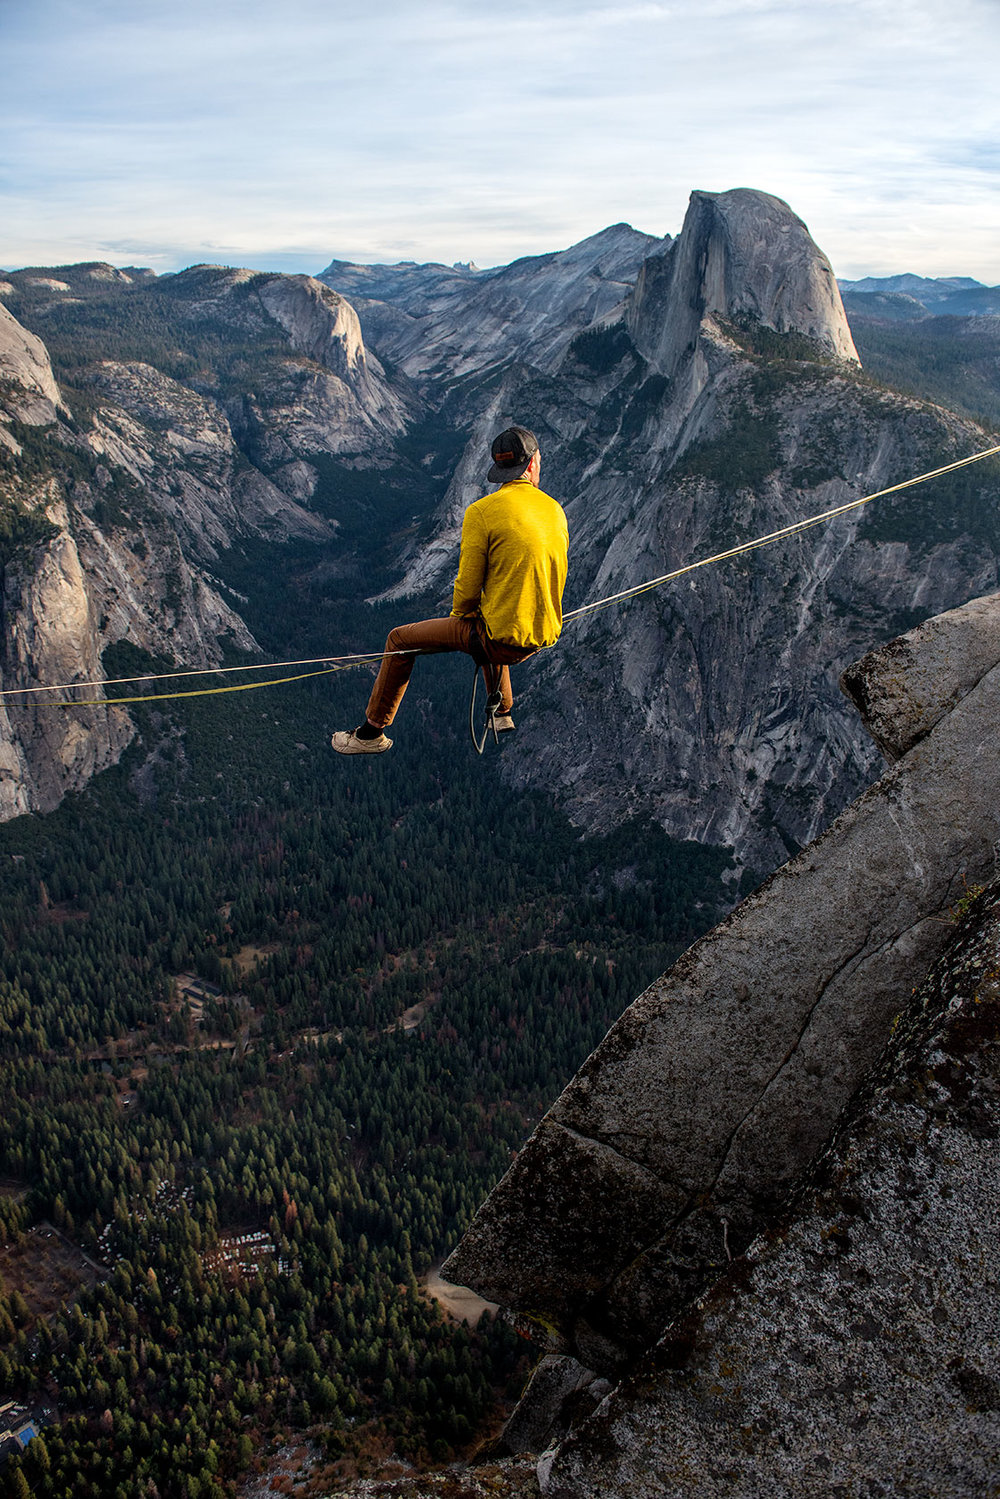 austin-trigg-yosemite-national-park-high-line-cliff-slackline-california-valley-view-sunrise-adventure.jpg